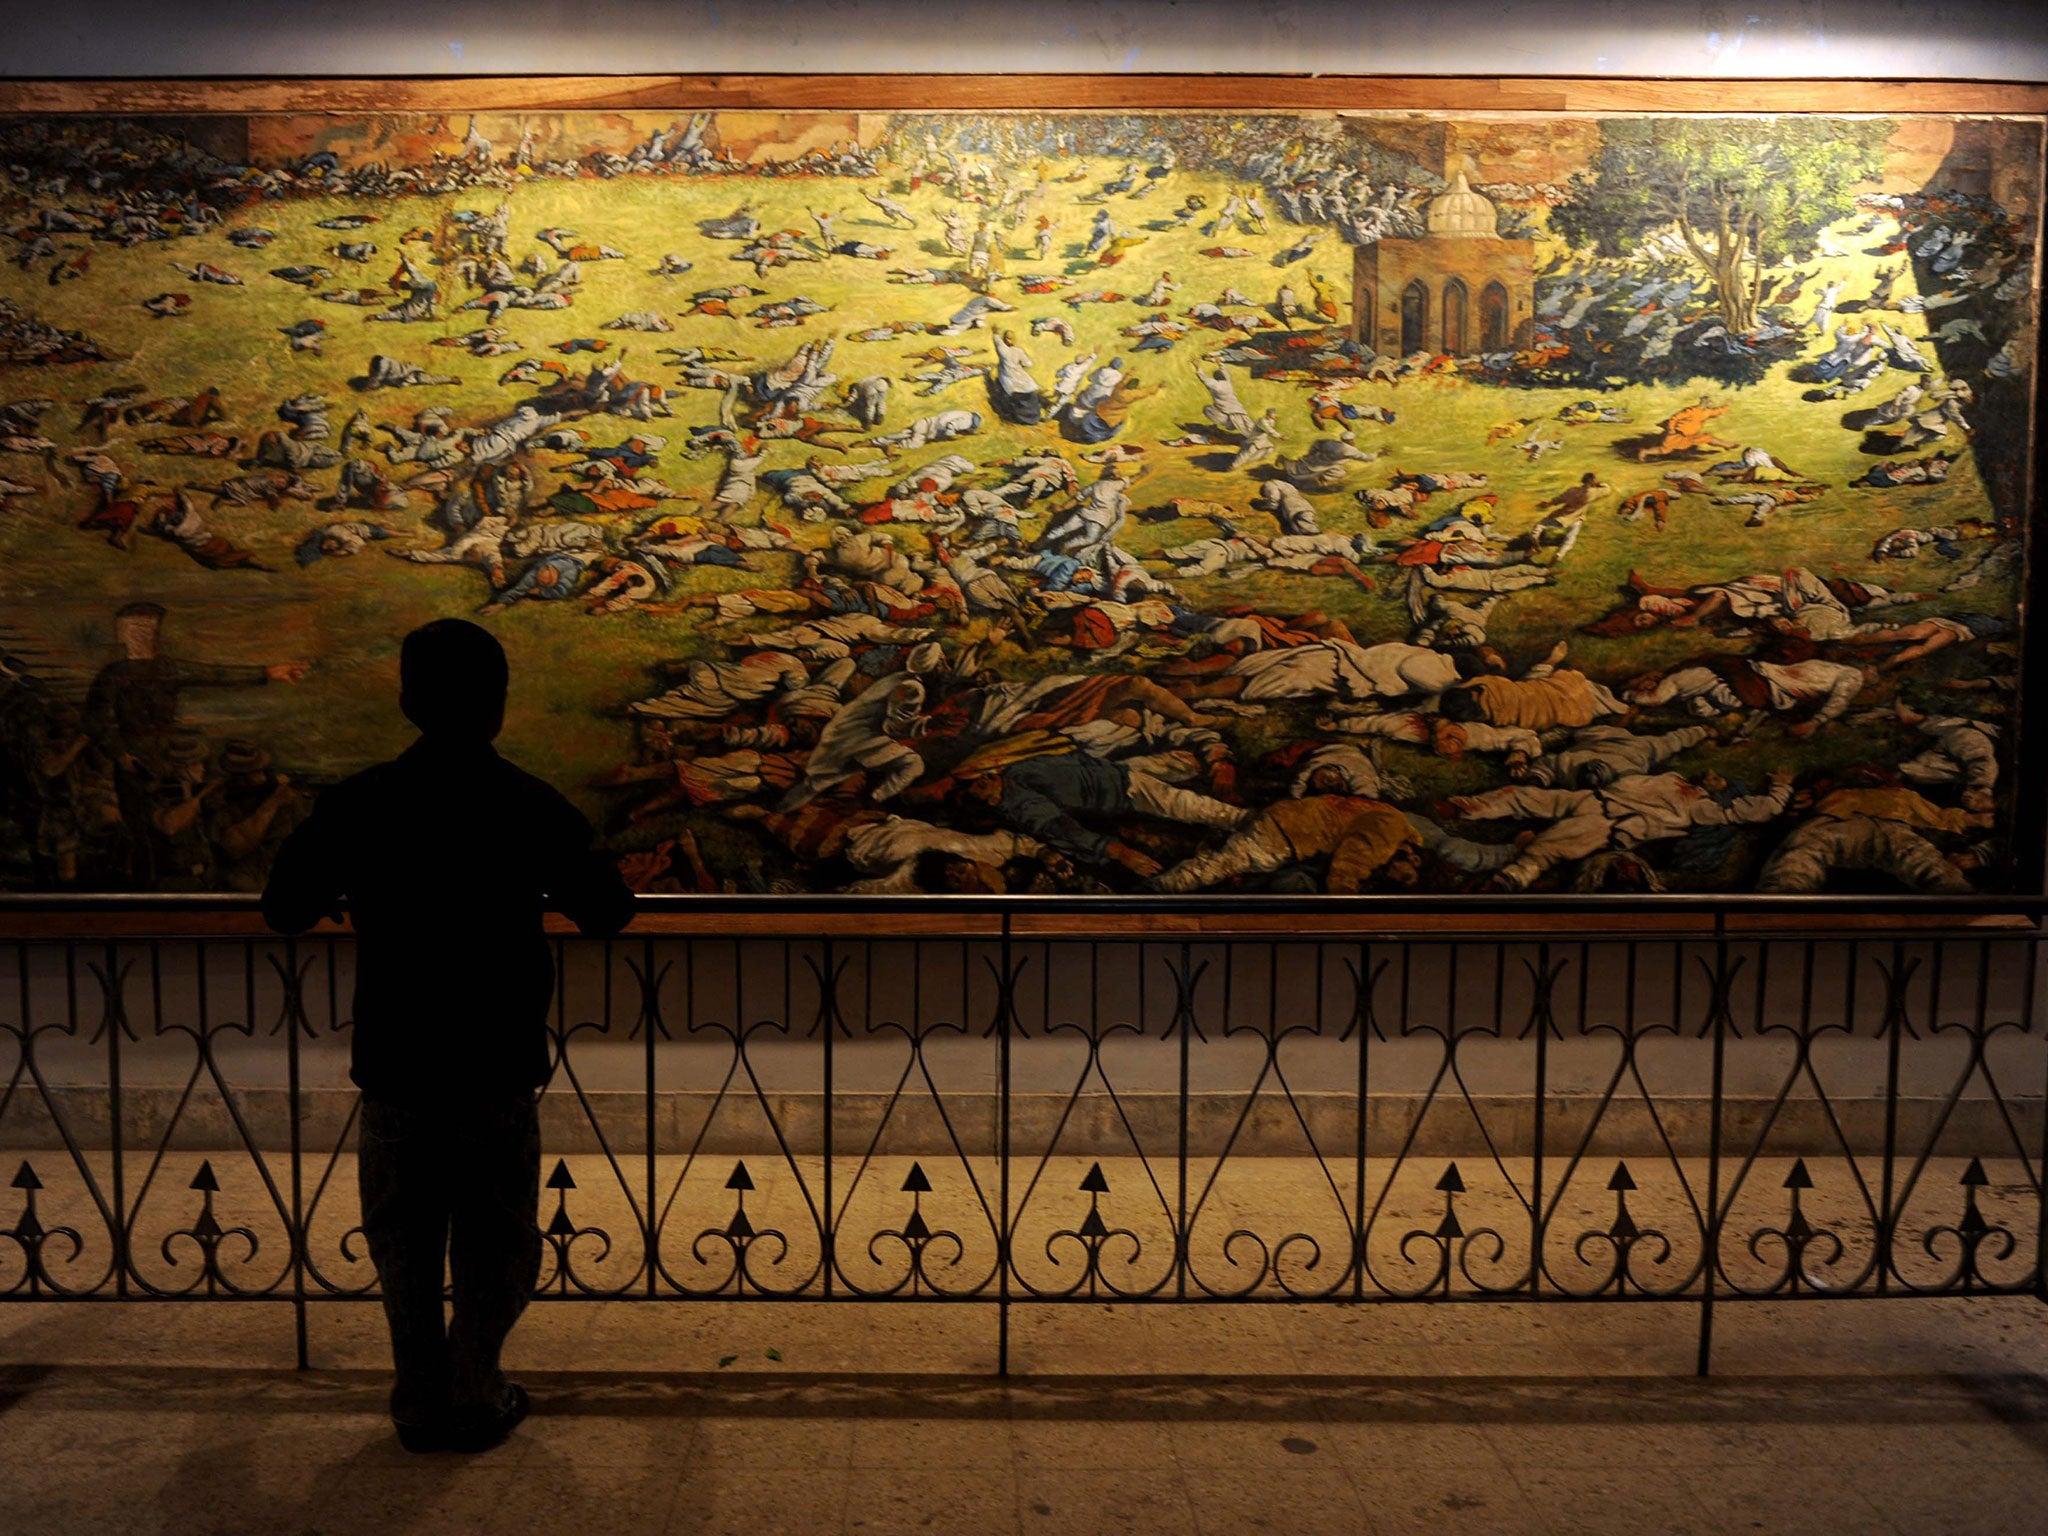 2. Amritsar massacre